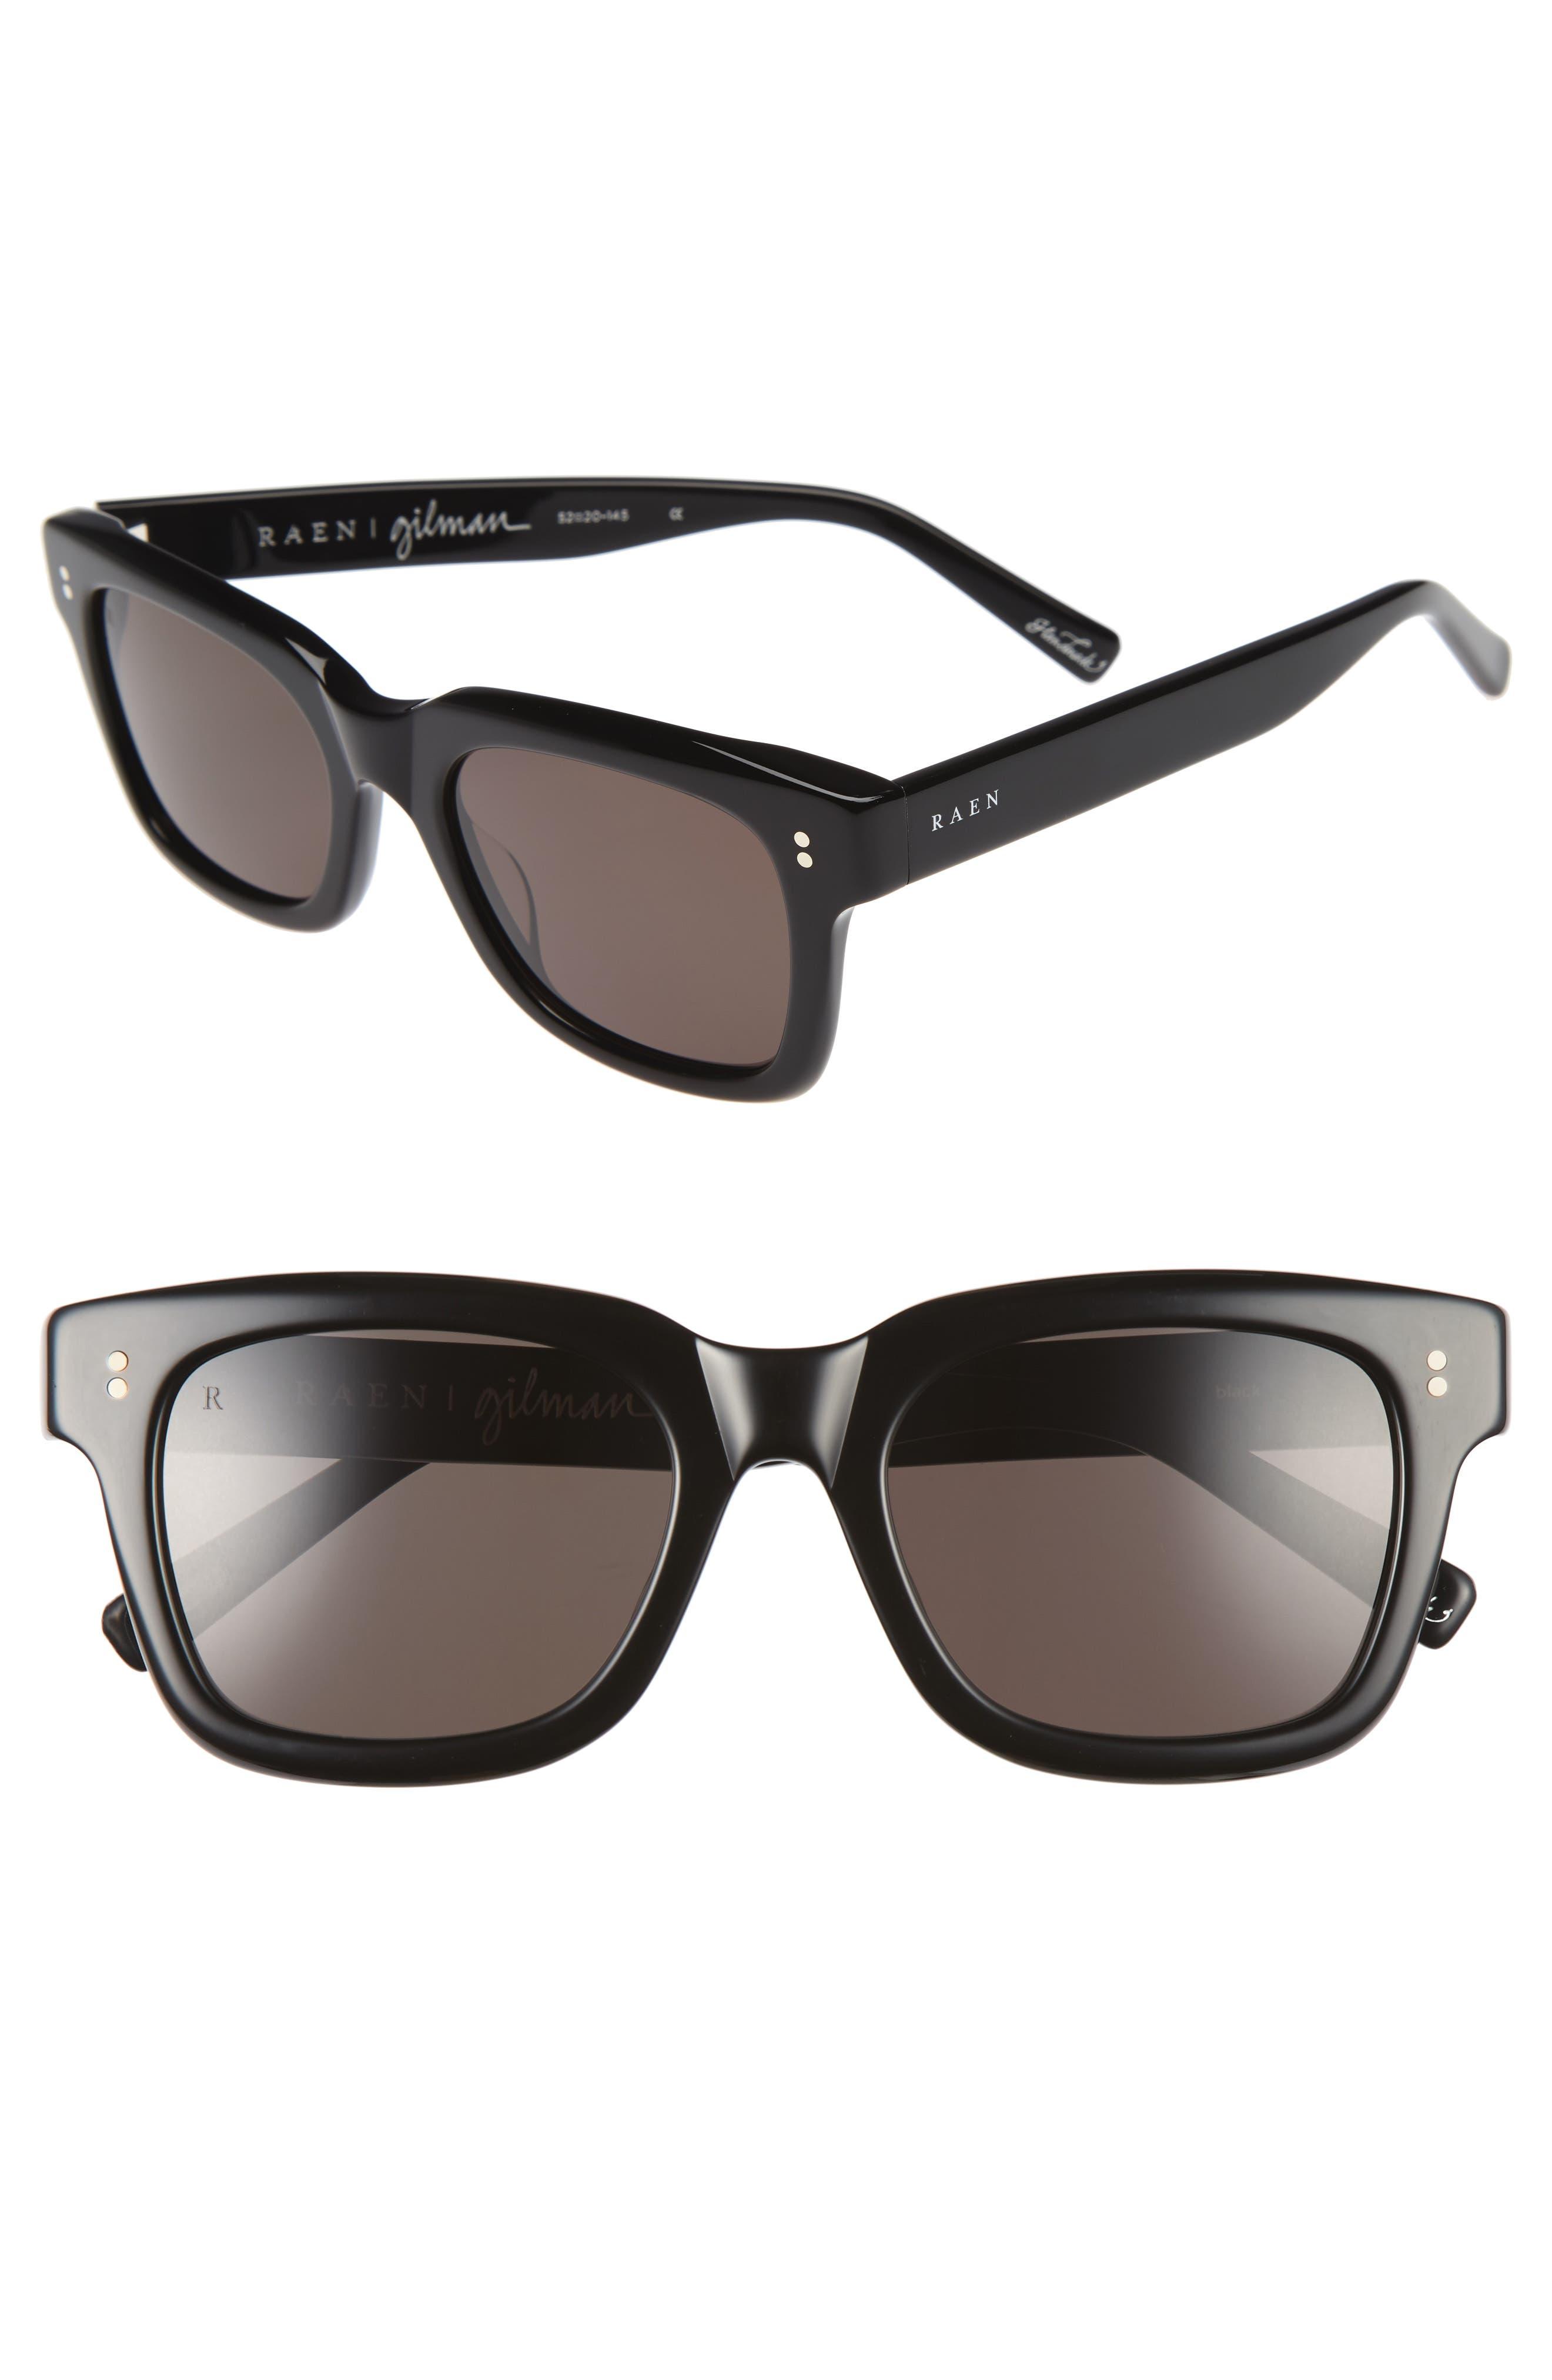 Gilman 52mm Sunglasses,                         Main,                         color, 001